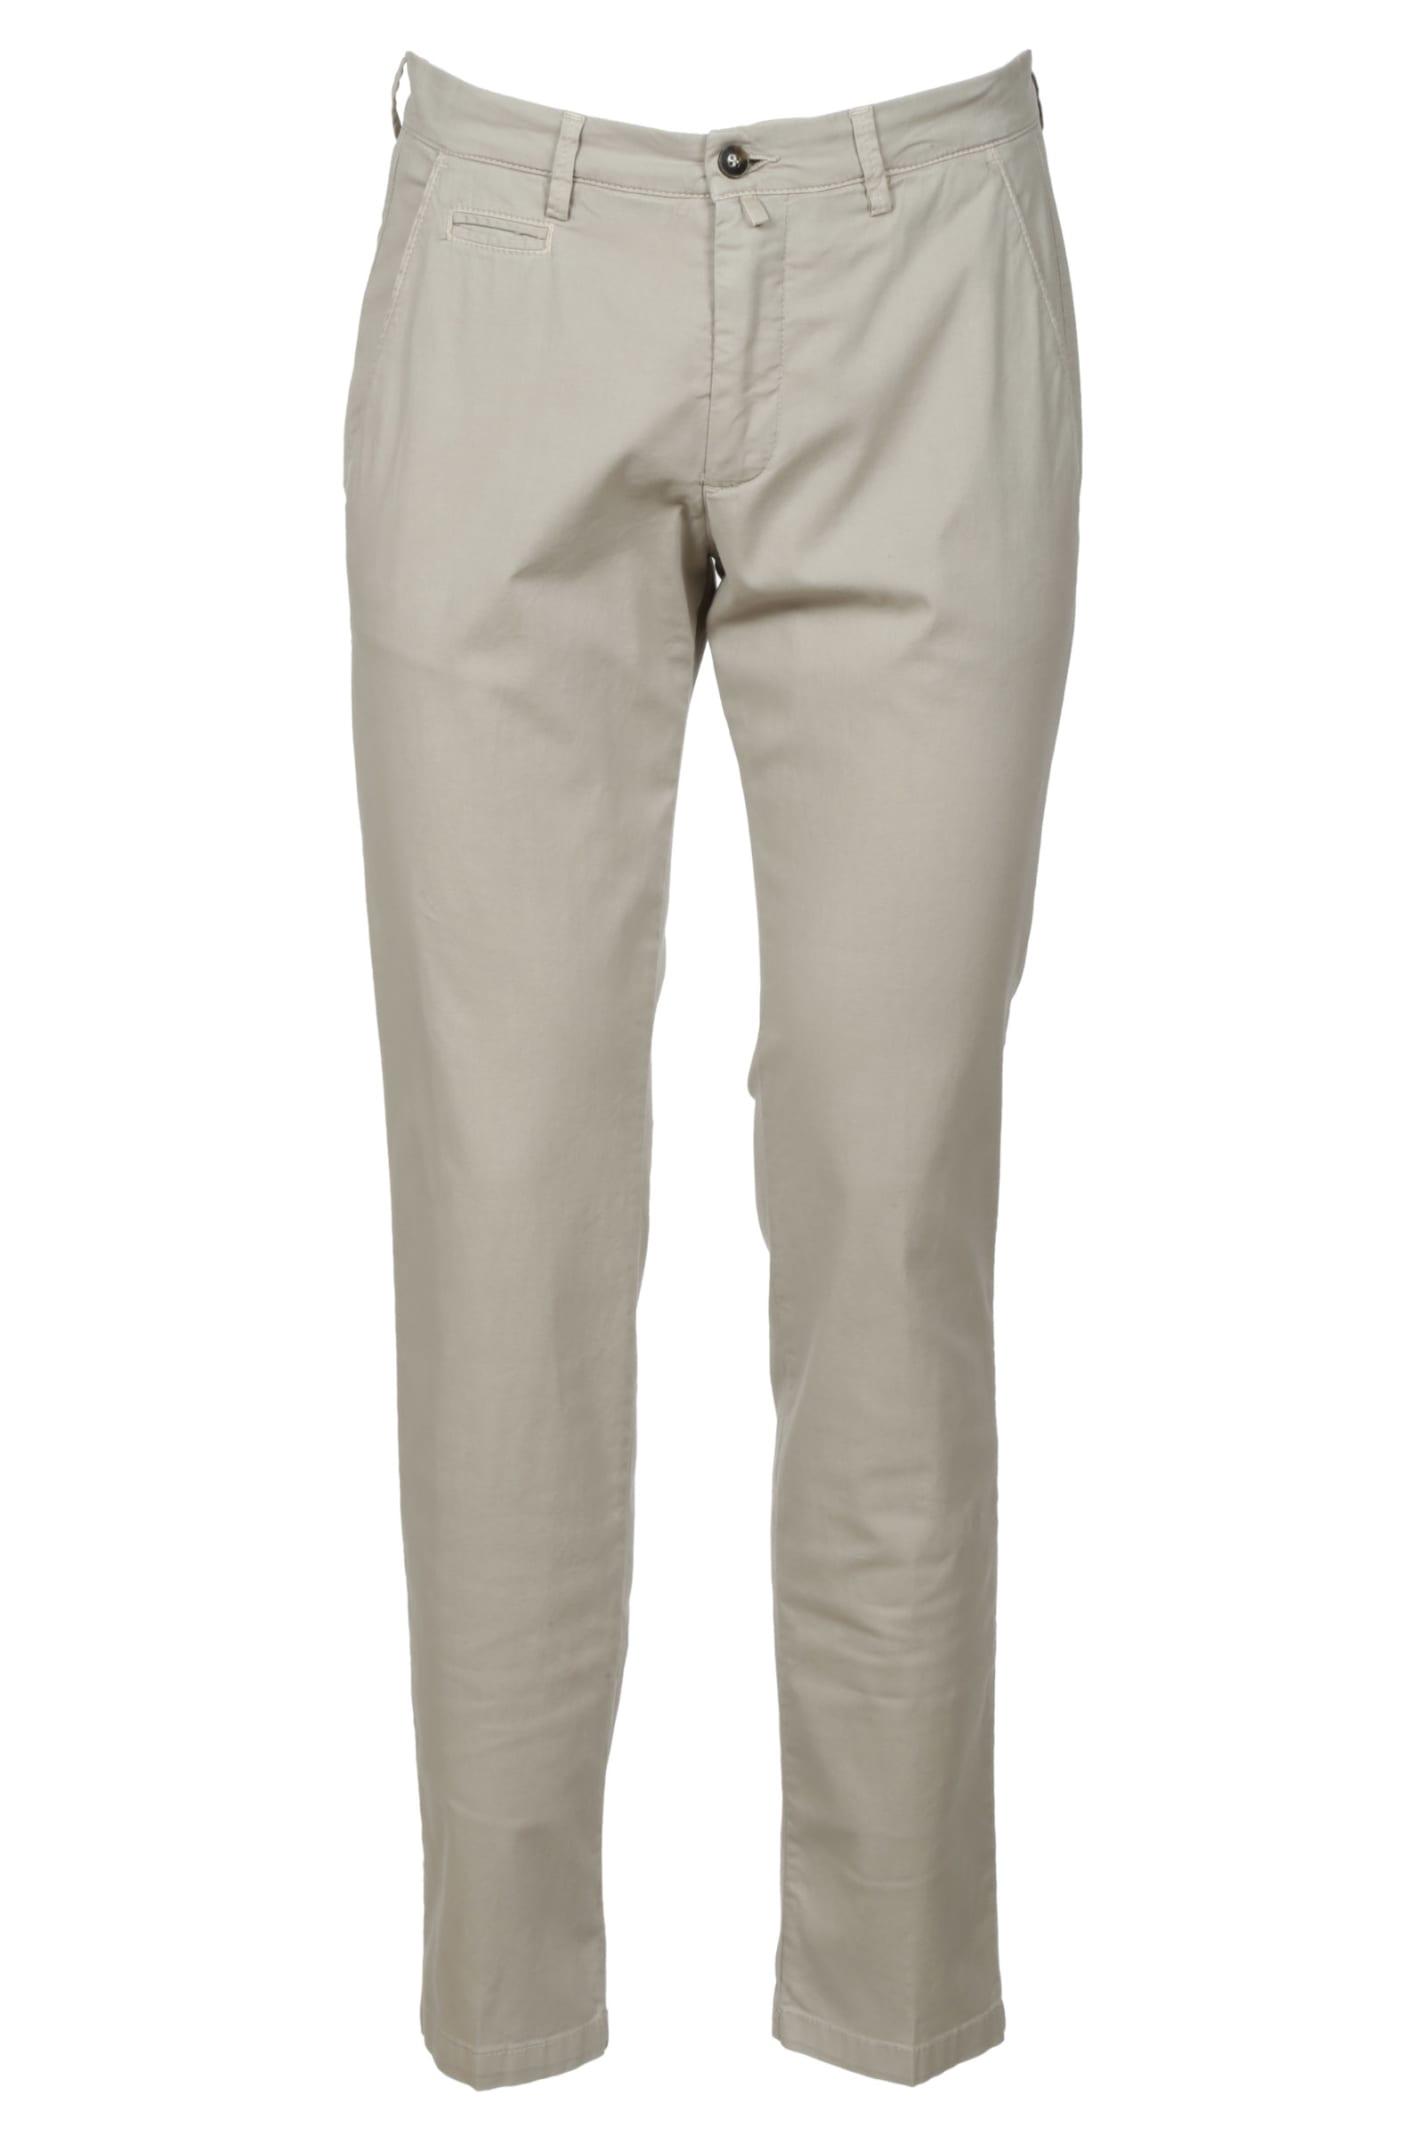 1949 Regular Fit Plain Trousers